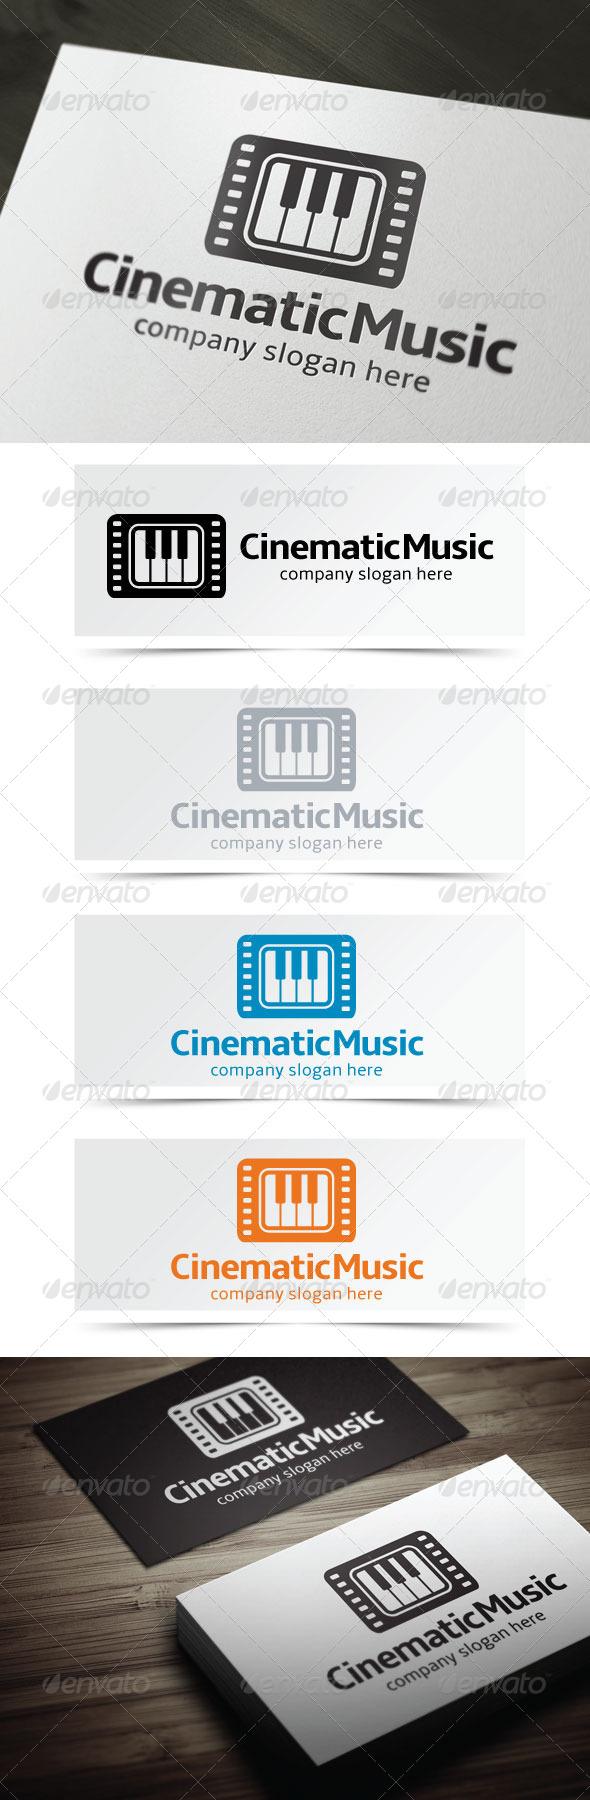 GraphicRiver Cinematic Music 4894744